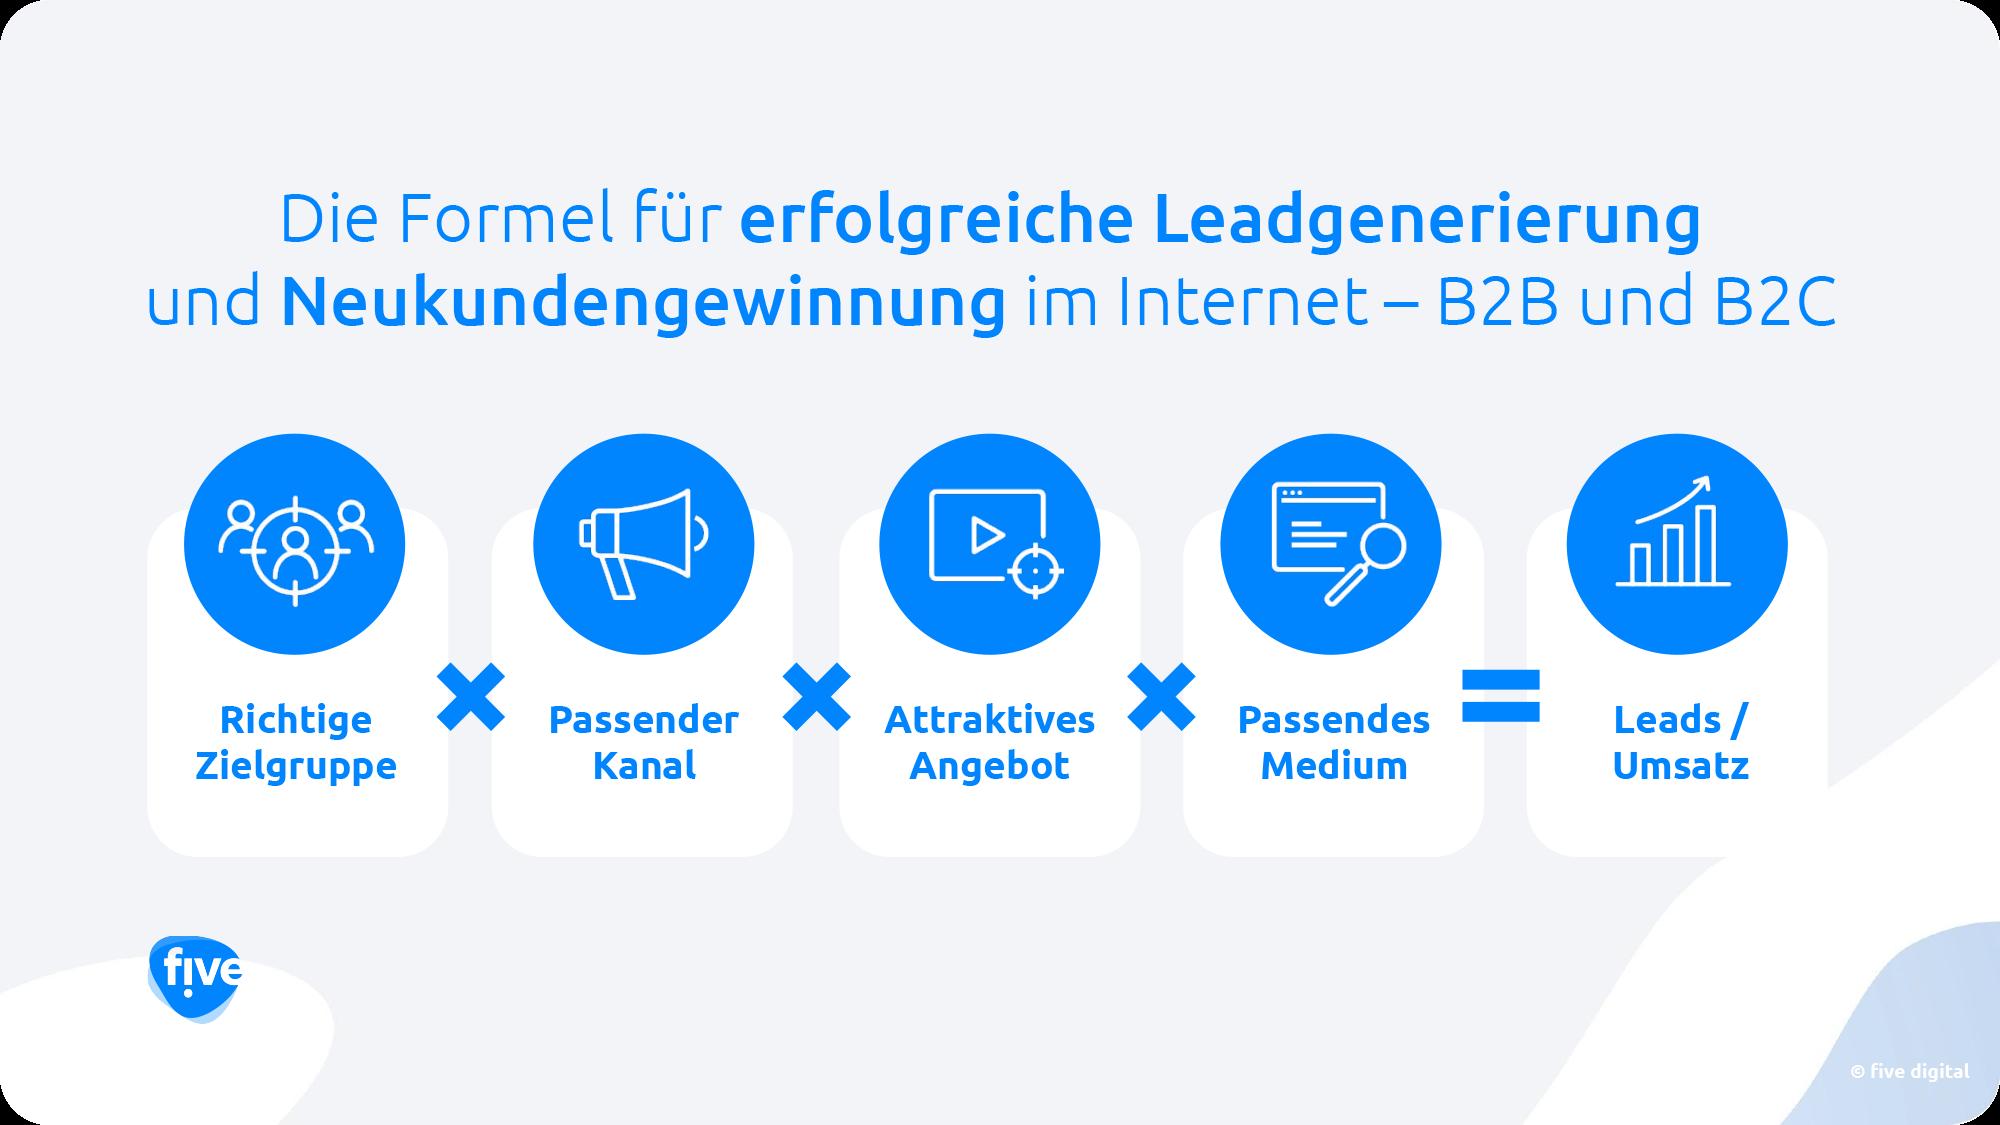 Leadgenerierung Formel_five digital